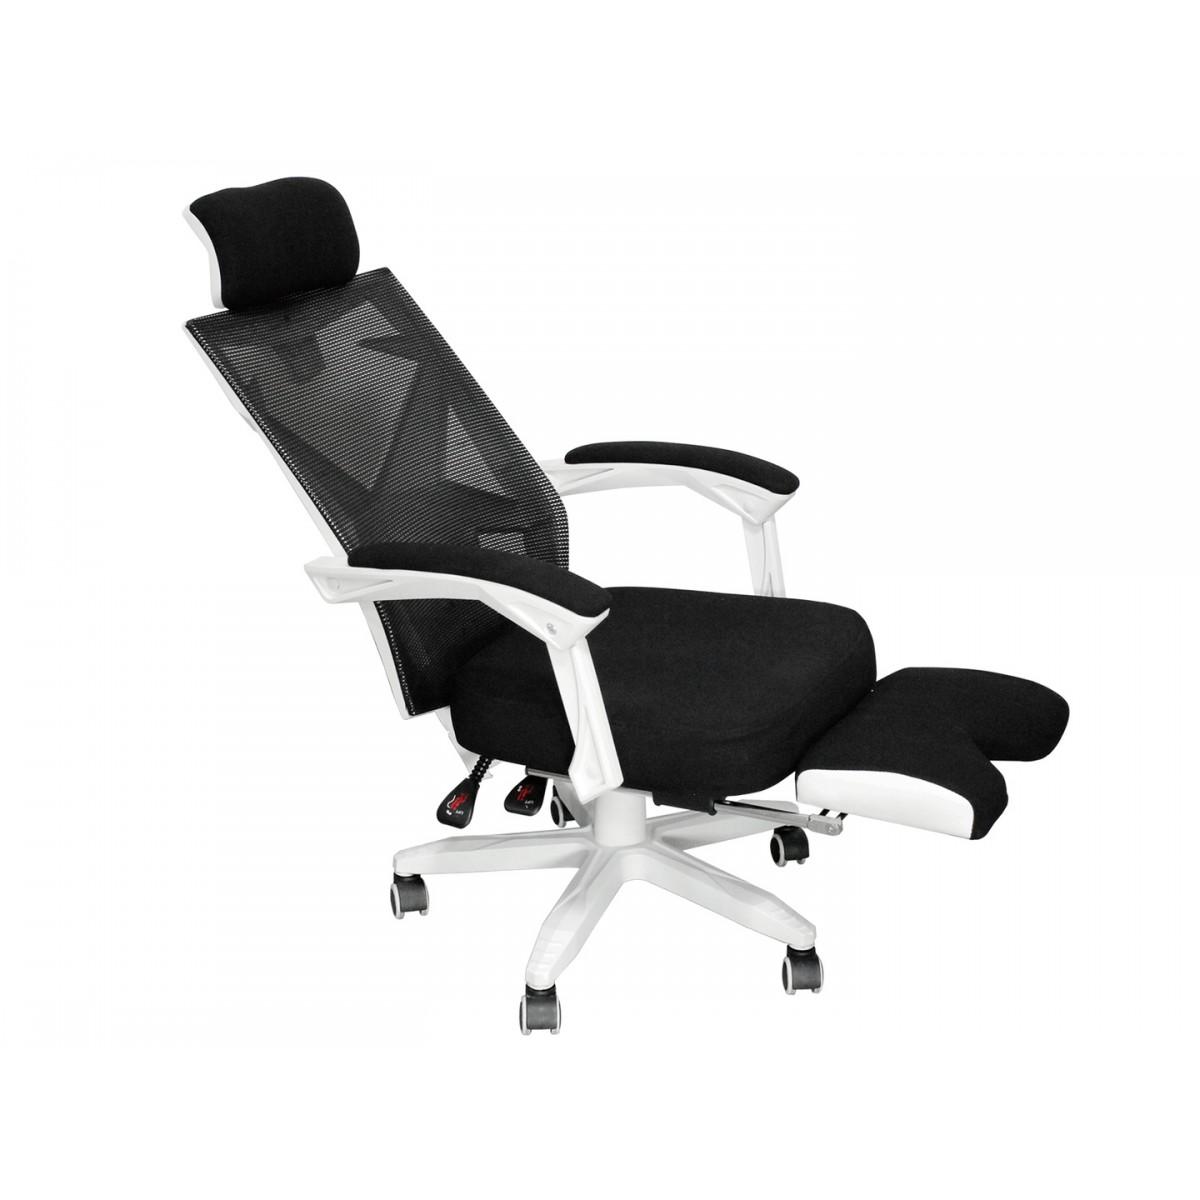 RAIDMAX Drakon DK805 Gaming Chair